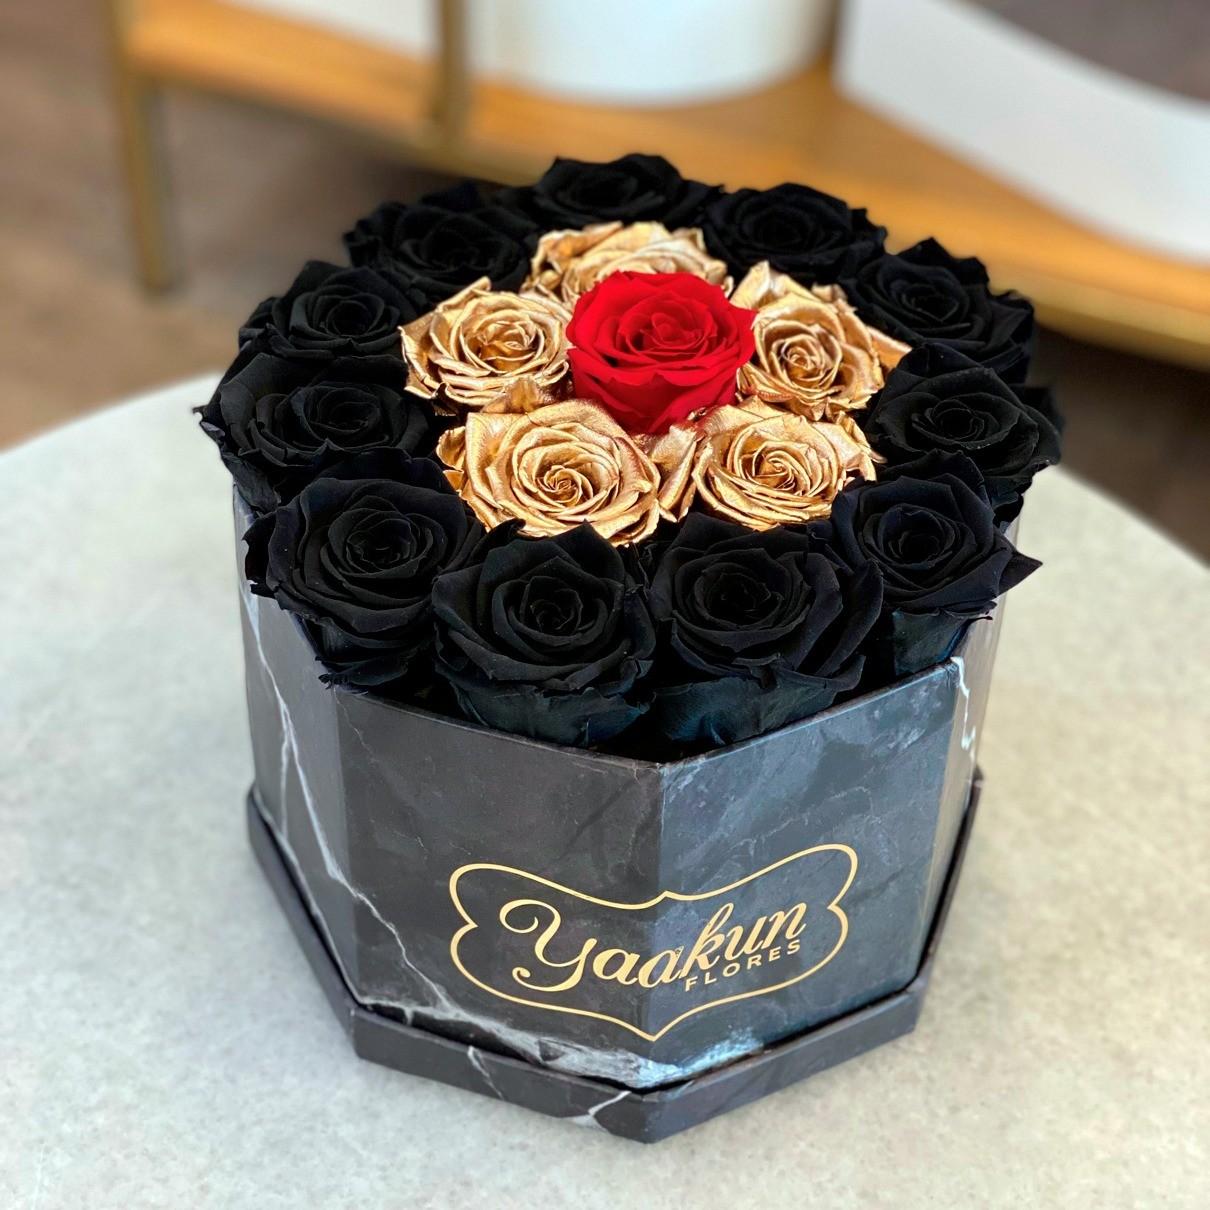 Rosas eternas en caja octagonal black, gold & red